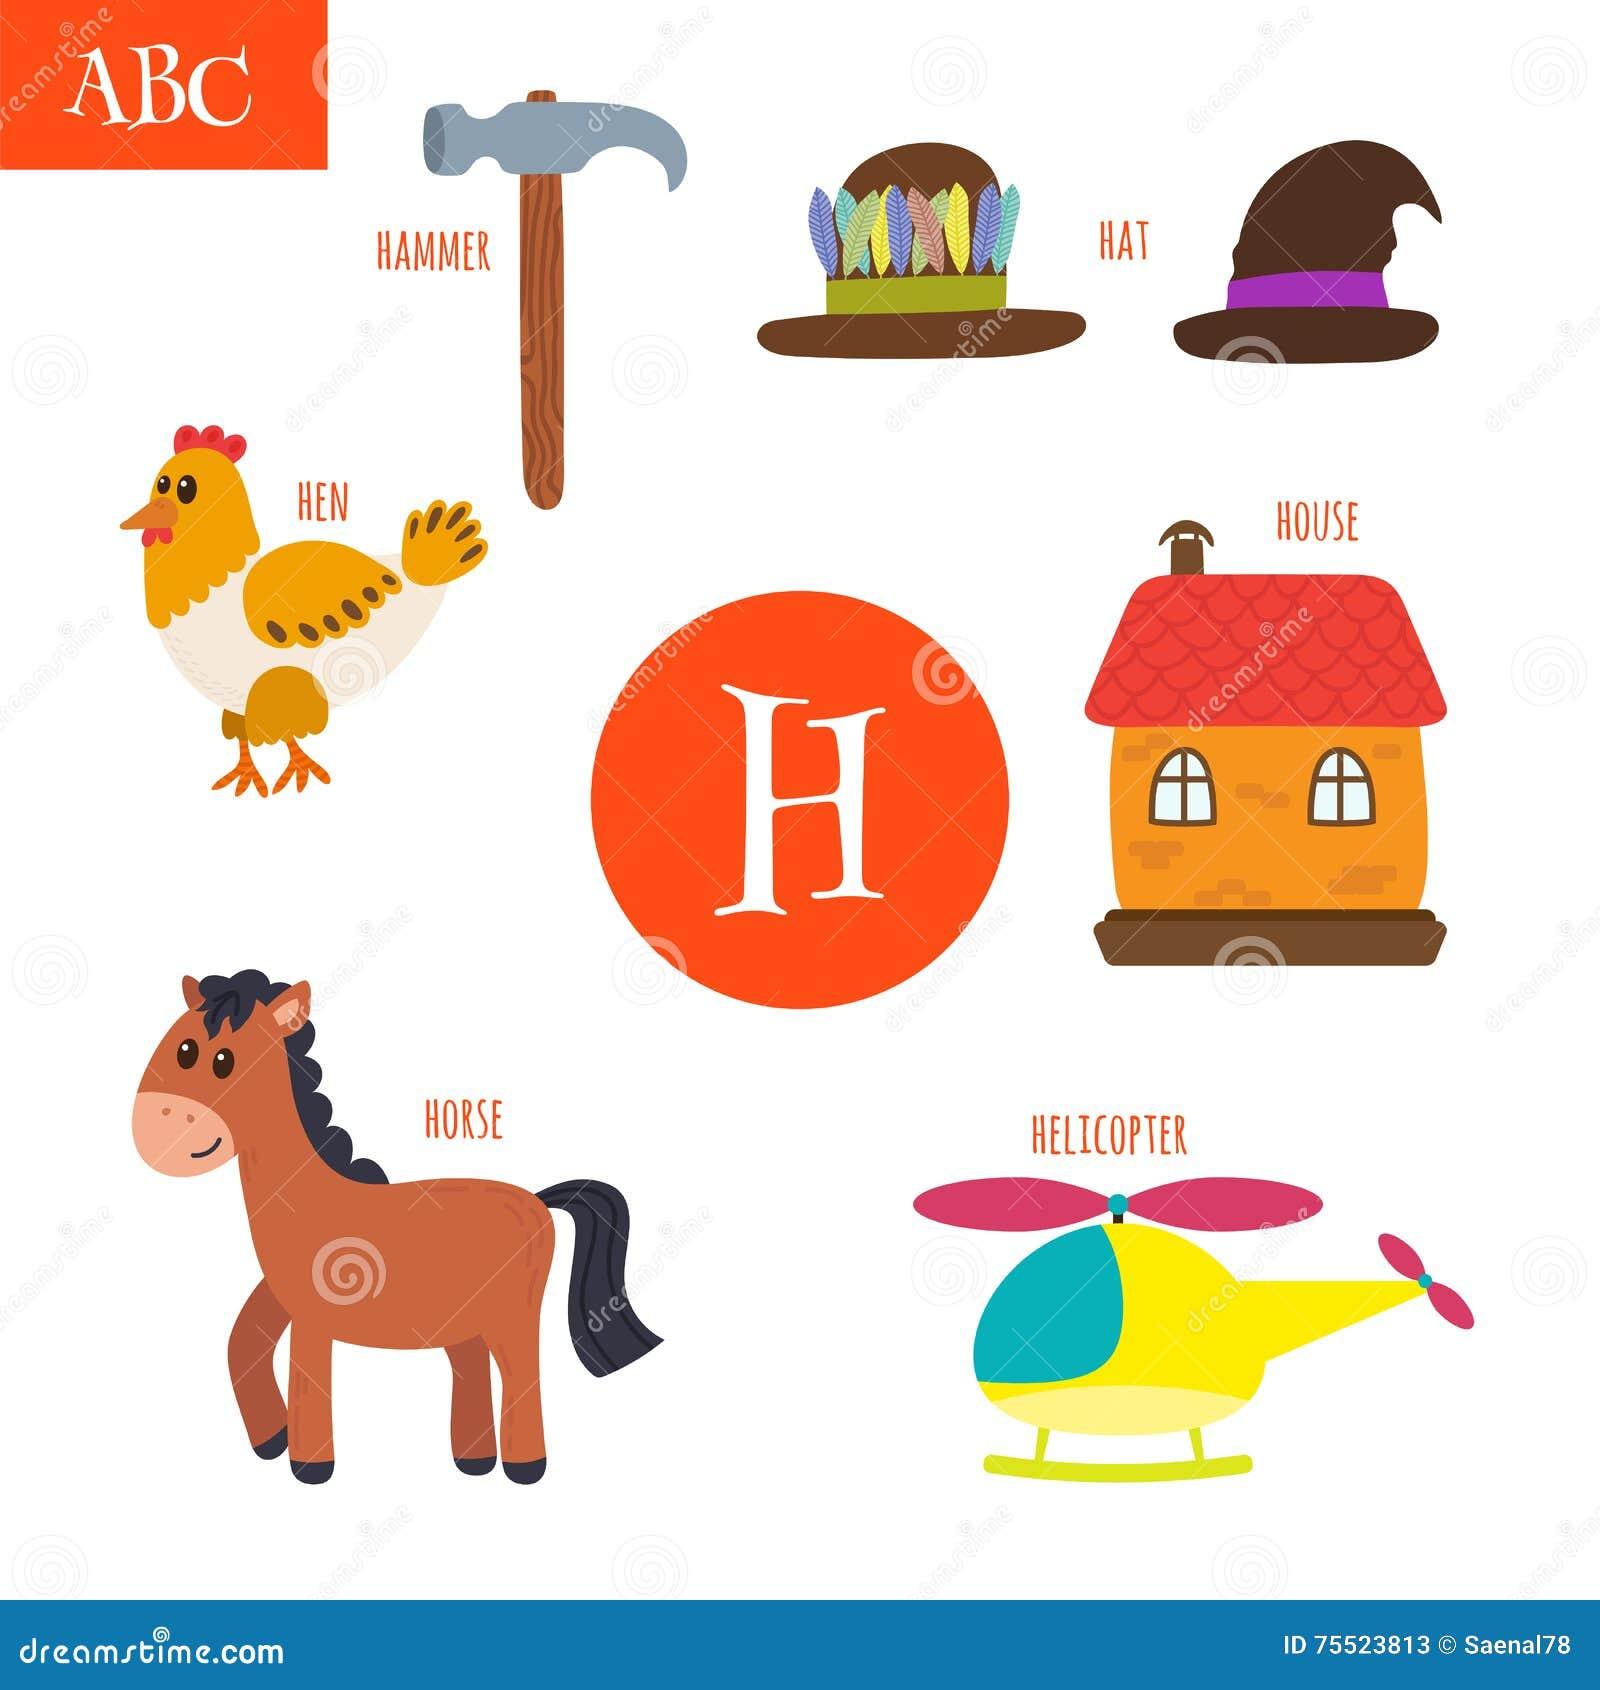 Letter h cartoon alphabet for children hen horse hat house letter h cartoon alphabet for children hen horse hat house thecheapjerseys Image collections